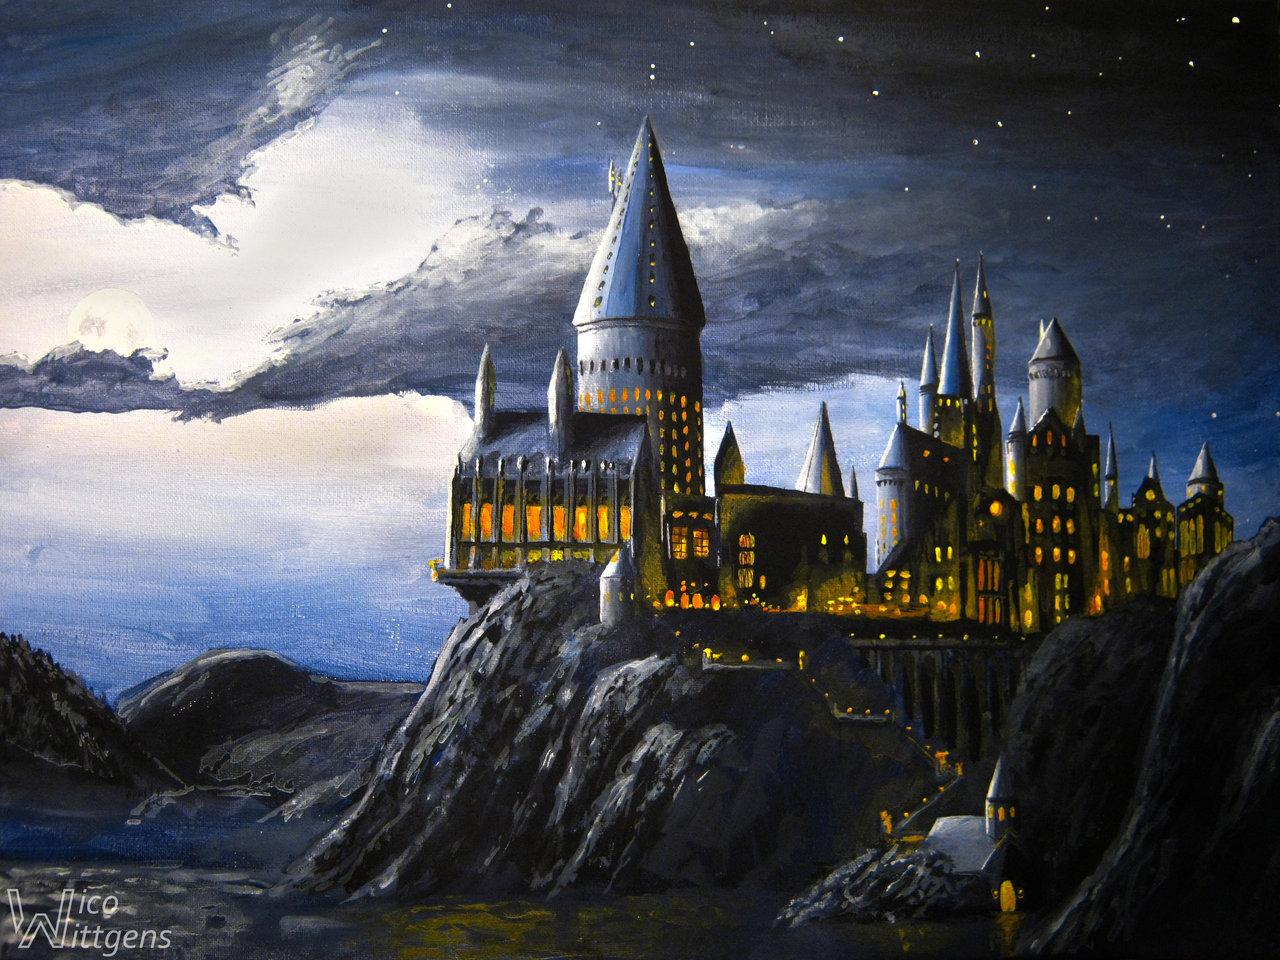 Free Download Hogwarts Castle Wallpaper Hogwarts At Night By Nicow92 1280x960 For Your Desktop Mobile Tablet Explore 49 Harry Potter Castle Wallpaper Harry Potter Castle Wallpaper Harry Potter Wallpaper